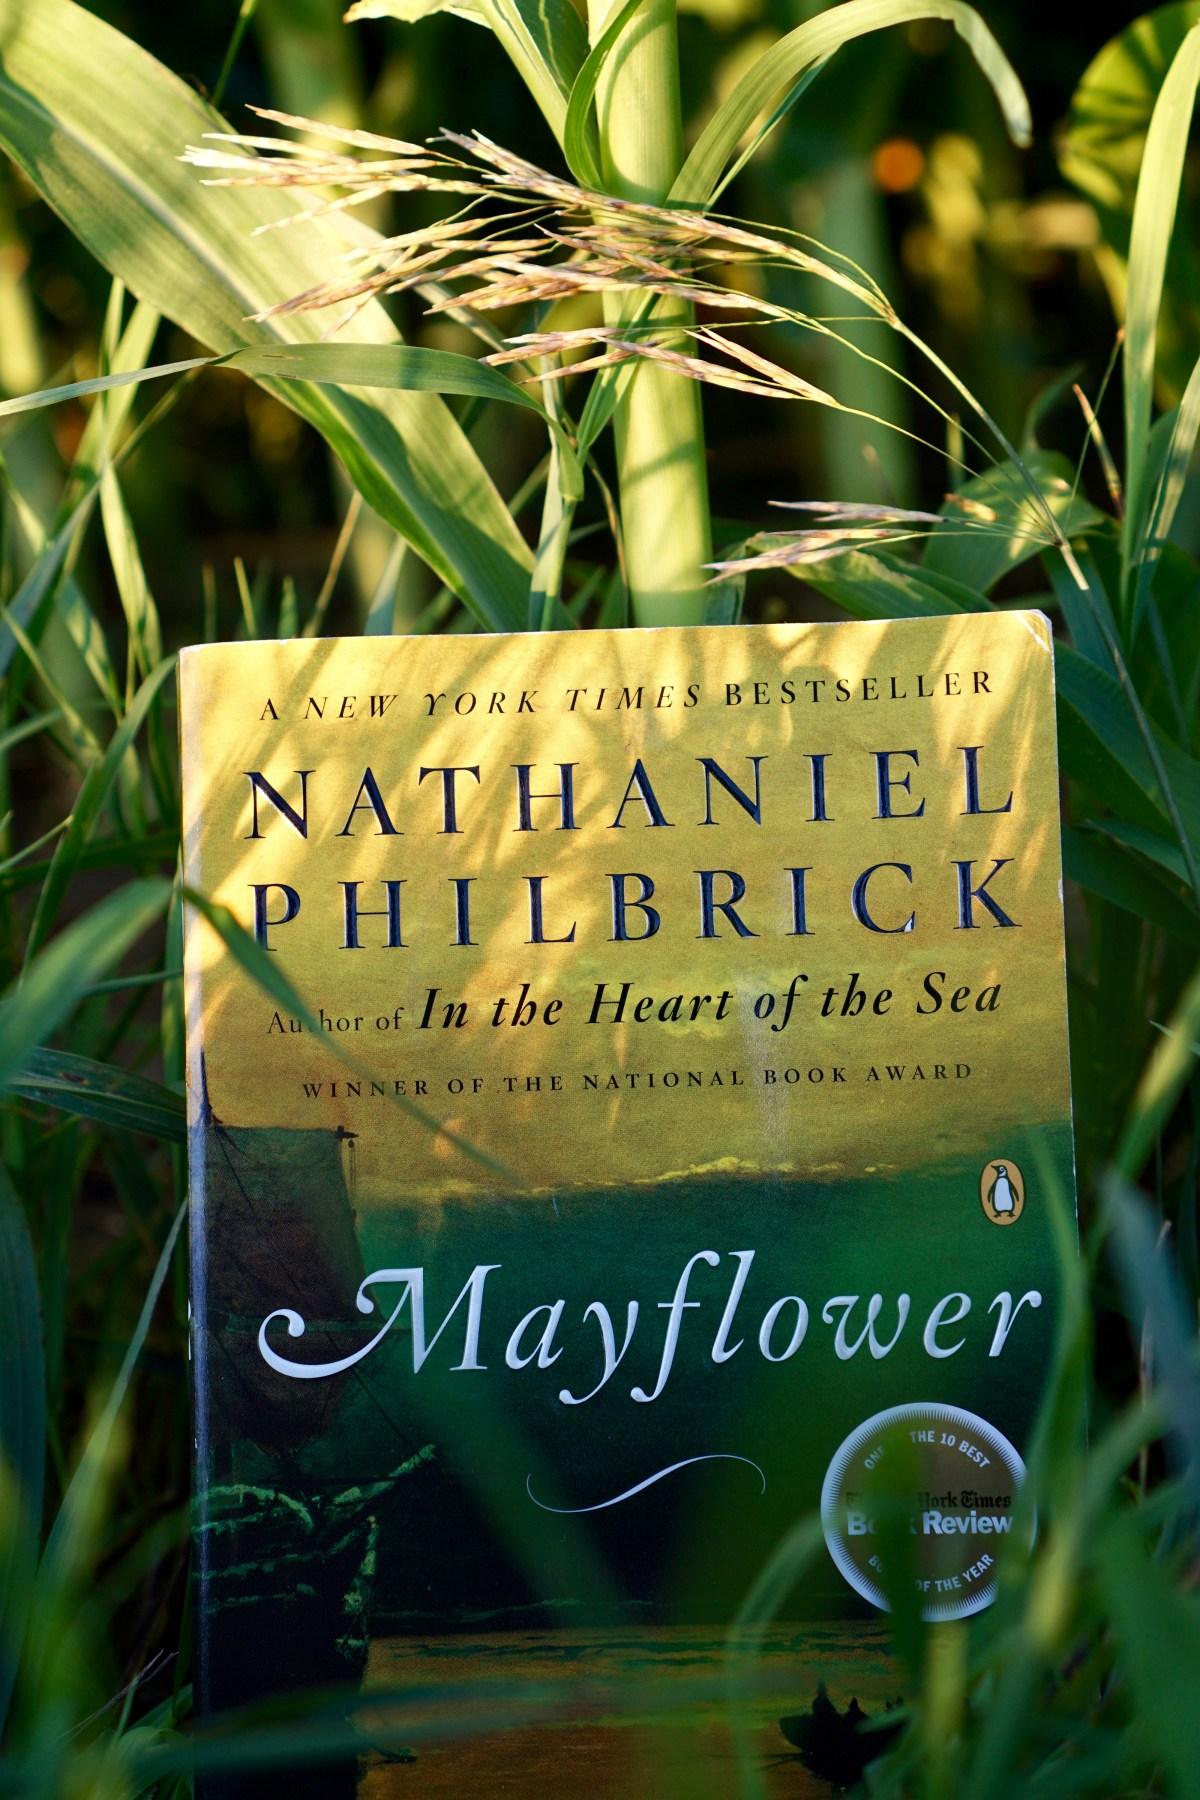 Mayflower by Nathaniel Philbrick © 2018 ericarobbin.com | All rights reserved.